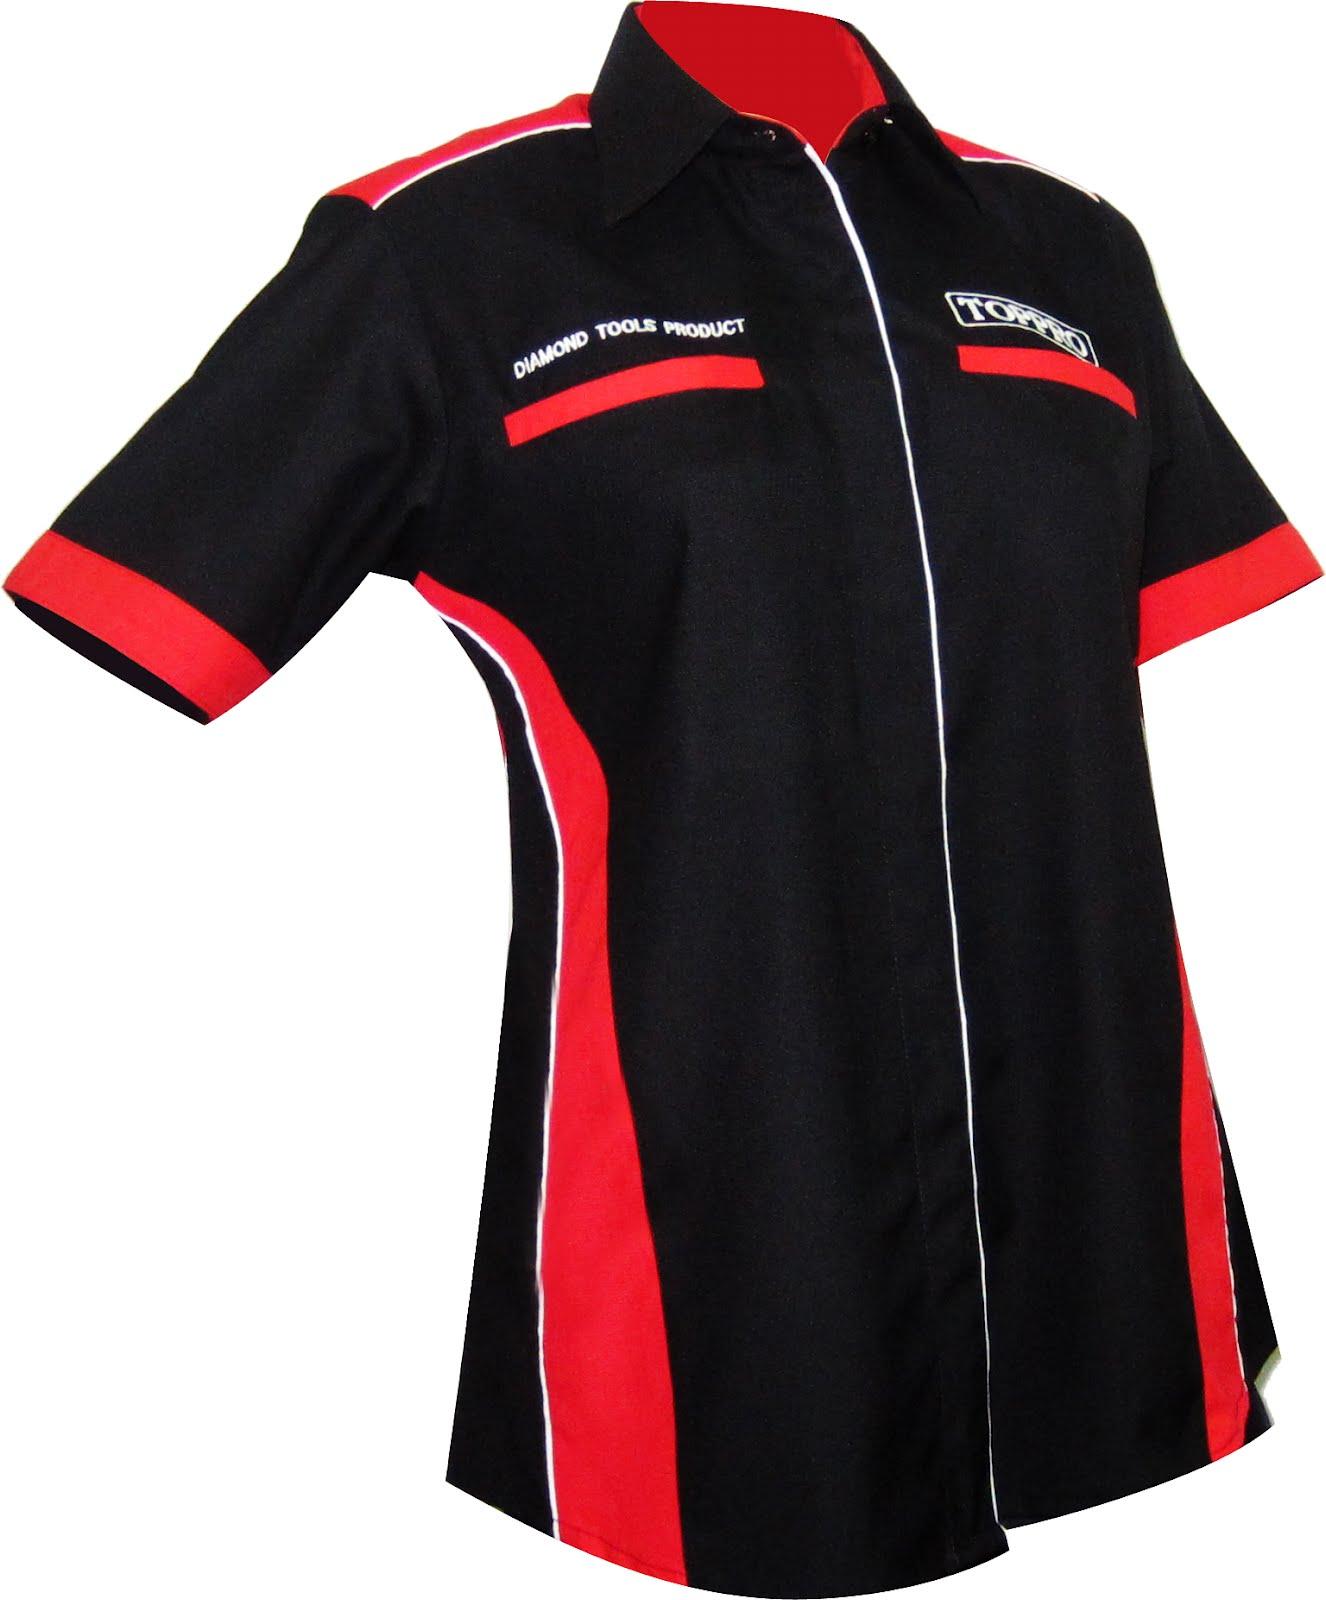 Corporate Shirt Customade CS 03 Red Black Corporate